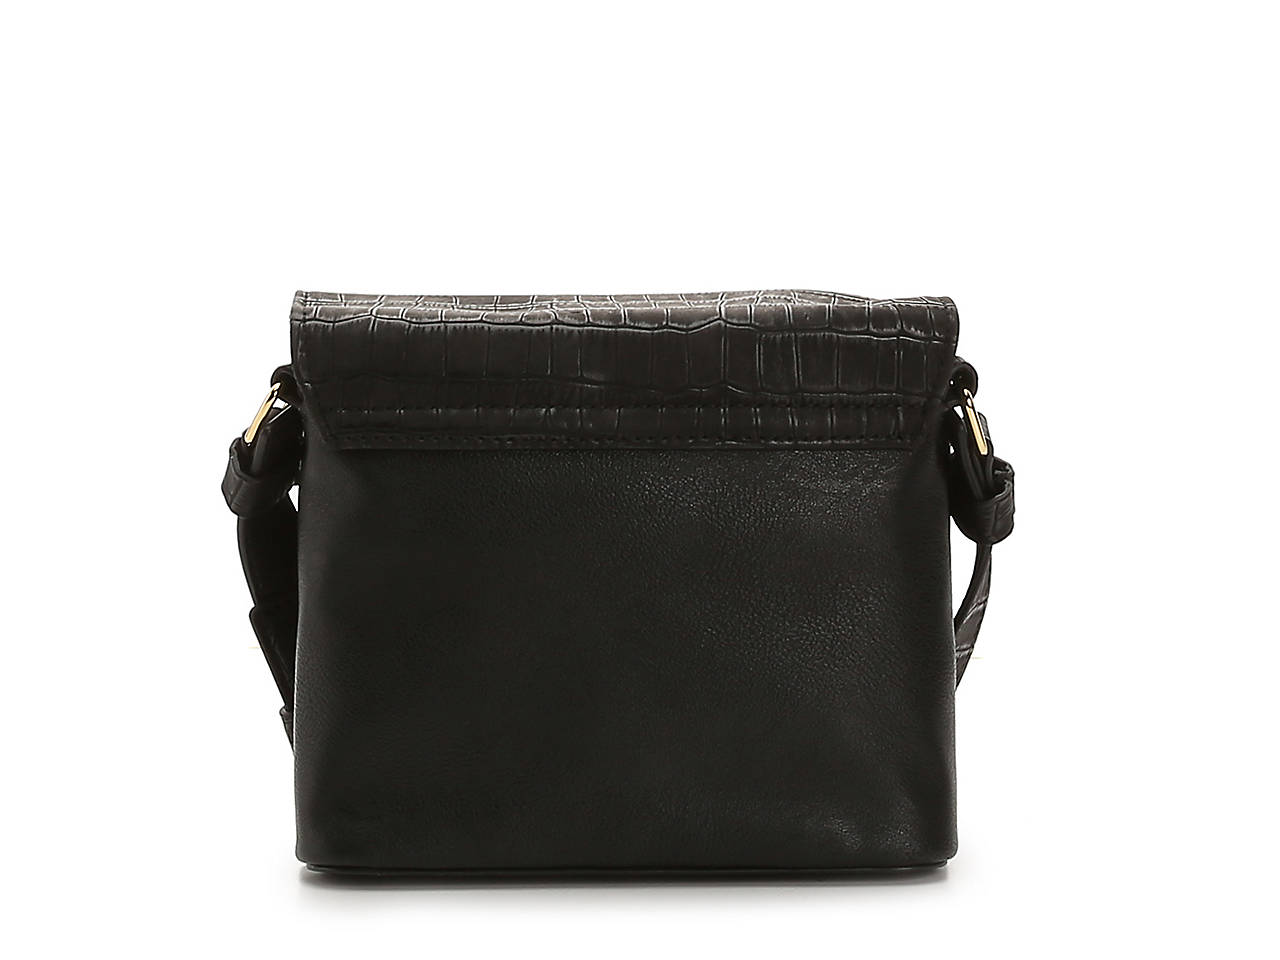 Previous Colette Crossbody Bag